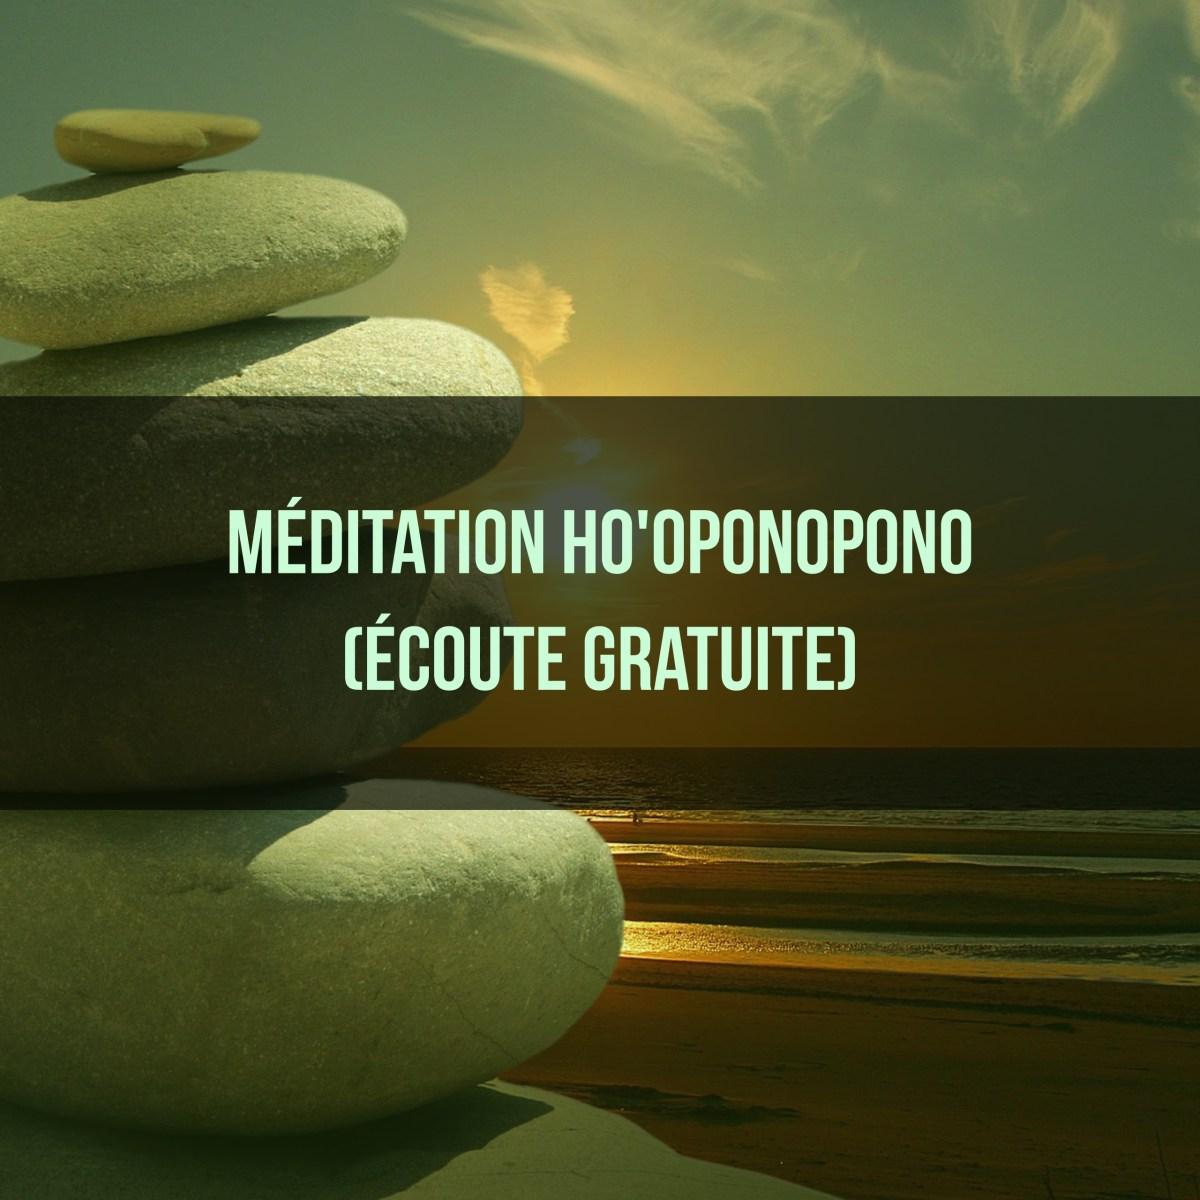 Méditation Ho'oponopono (écoute gratuite)